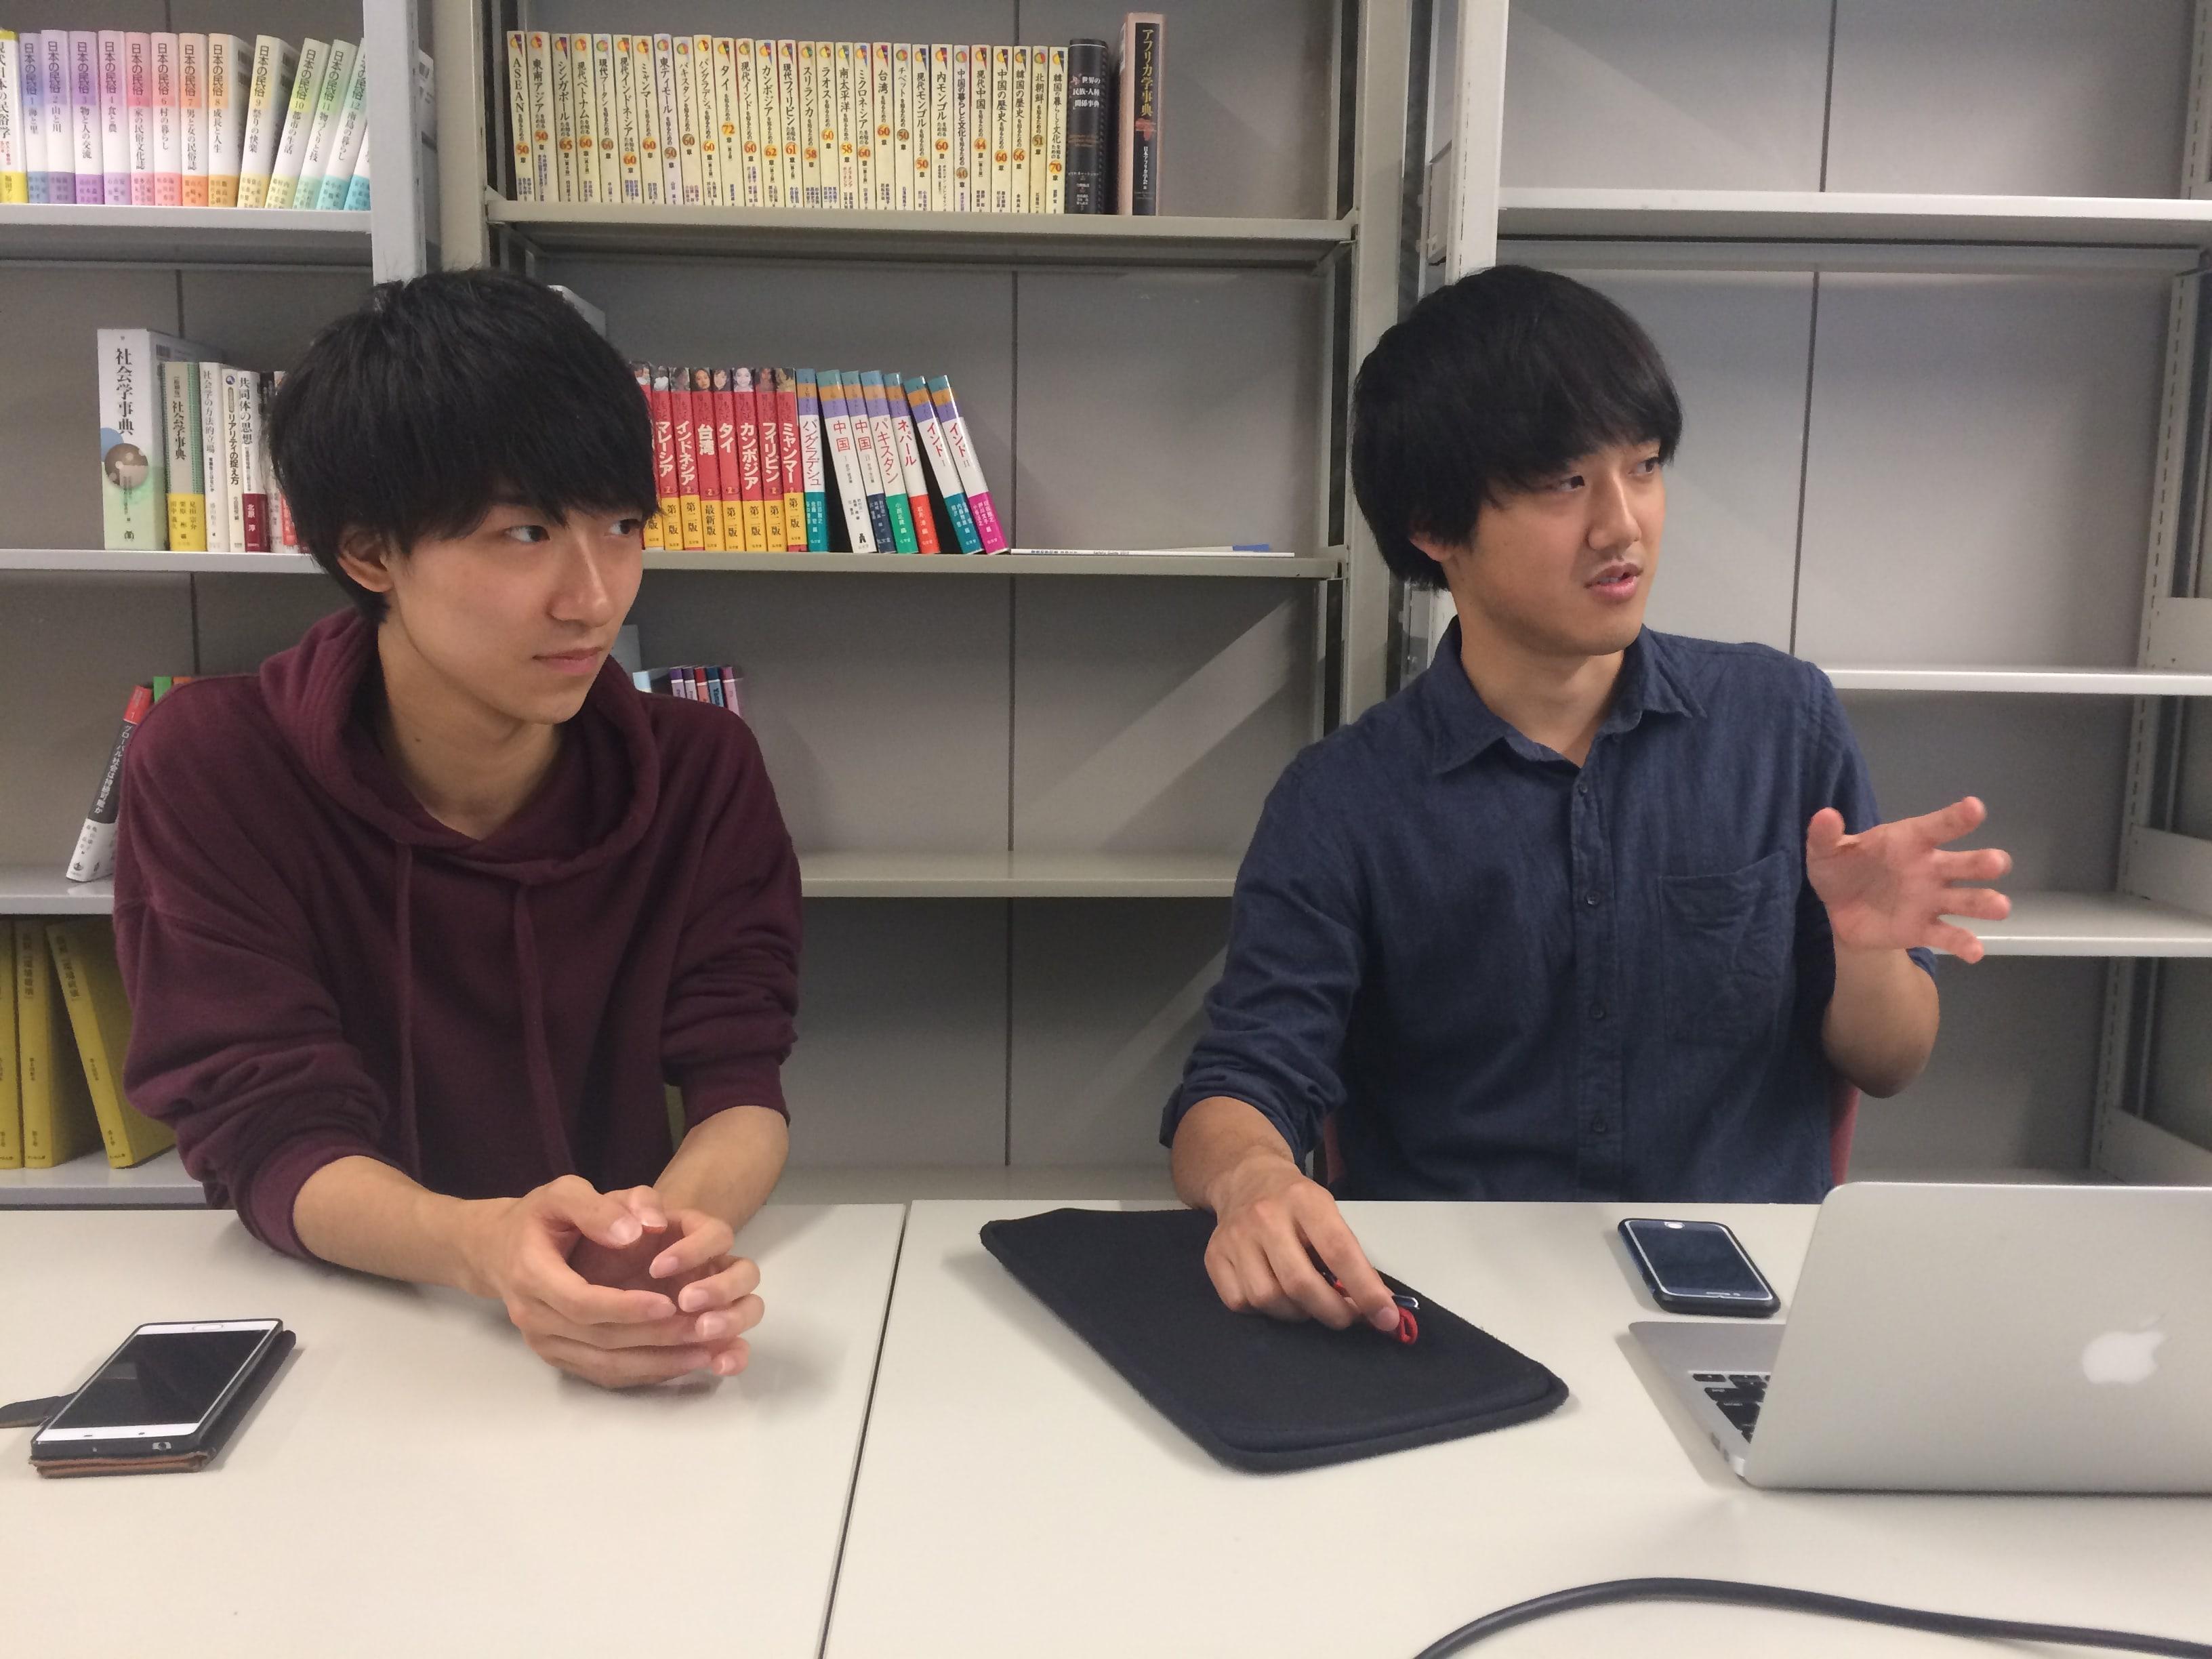 Stock(ストック)インタビューゼミ生の髙橋さん(学部3年生)・小林さん(学部3年生)写真